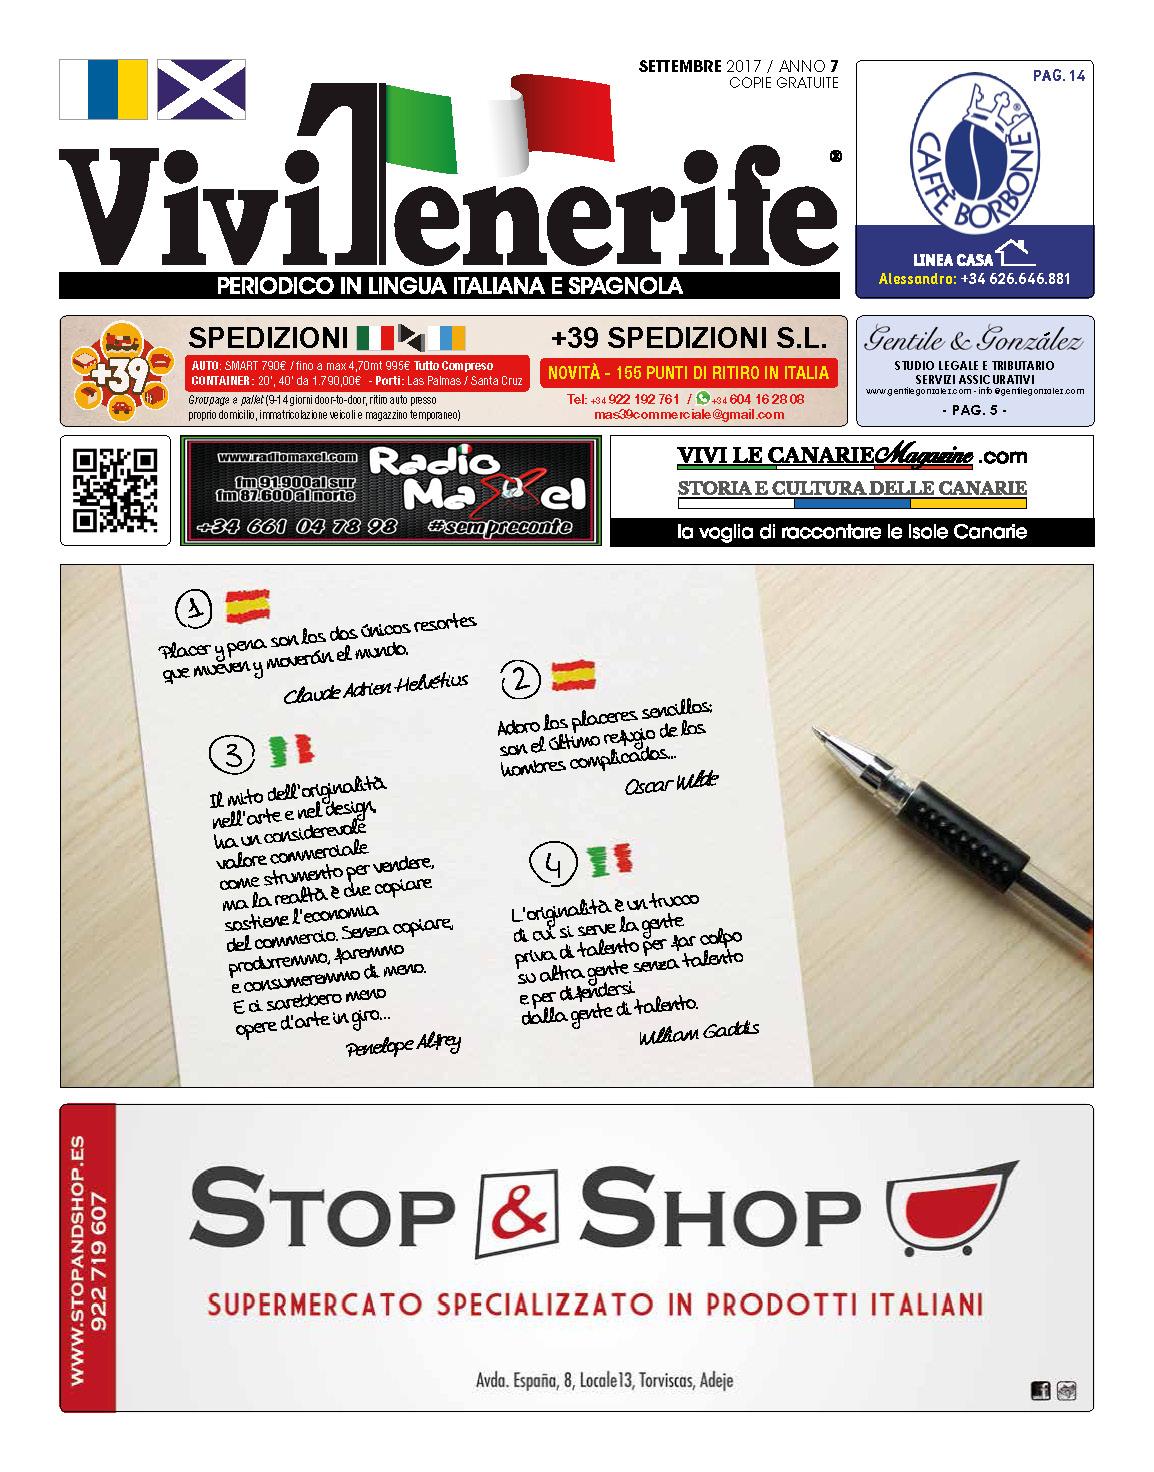 ViviTenerife Settembre 2017